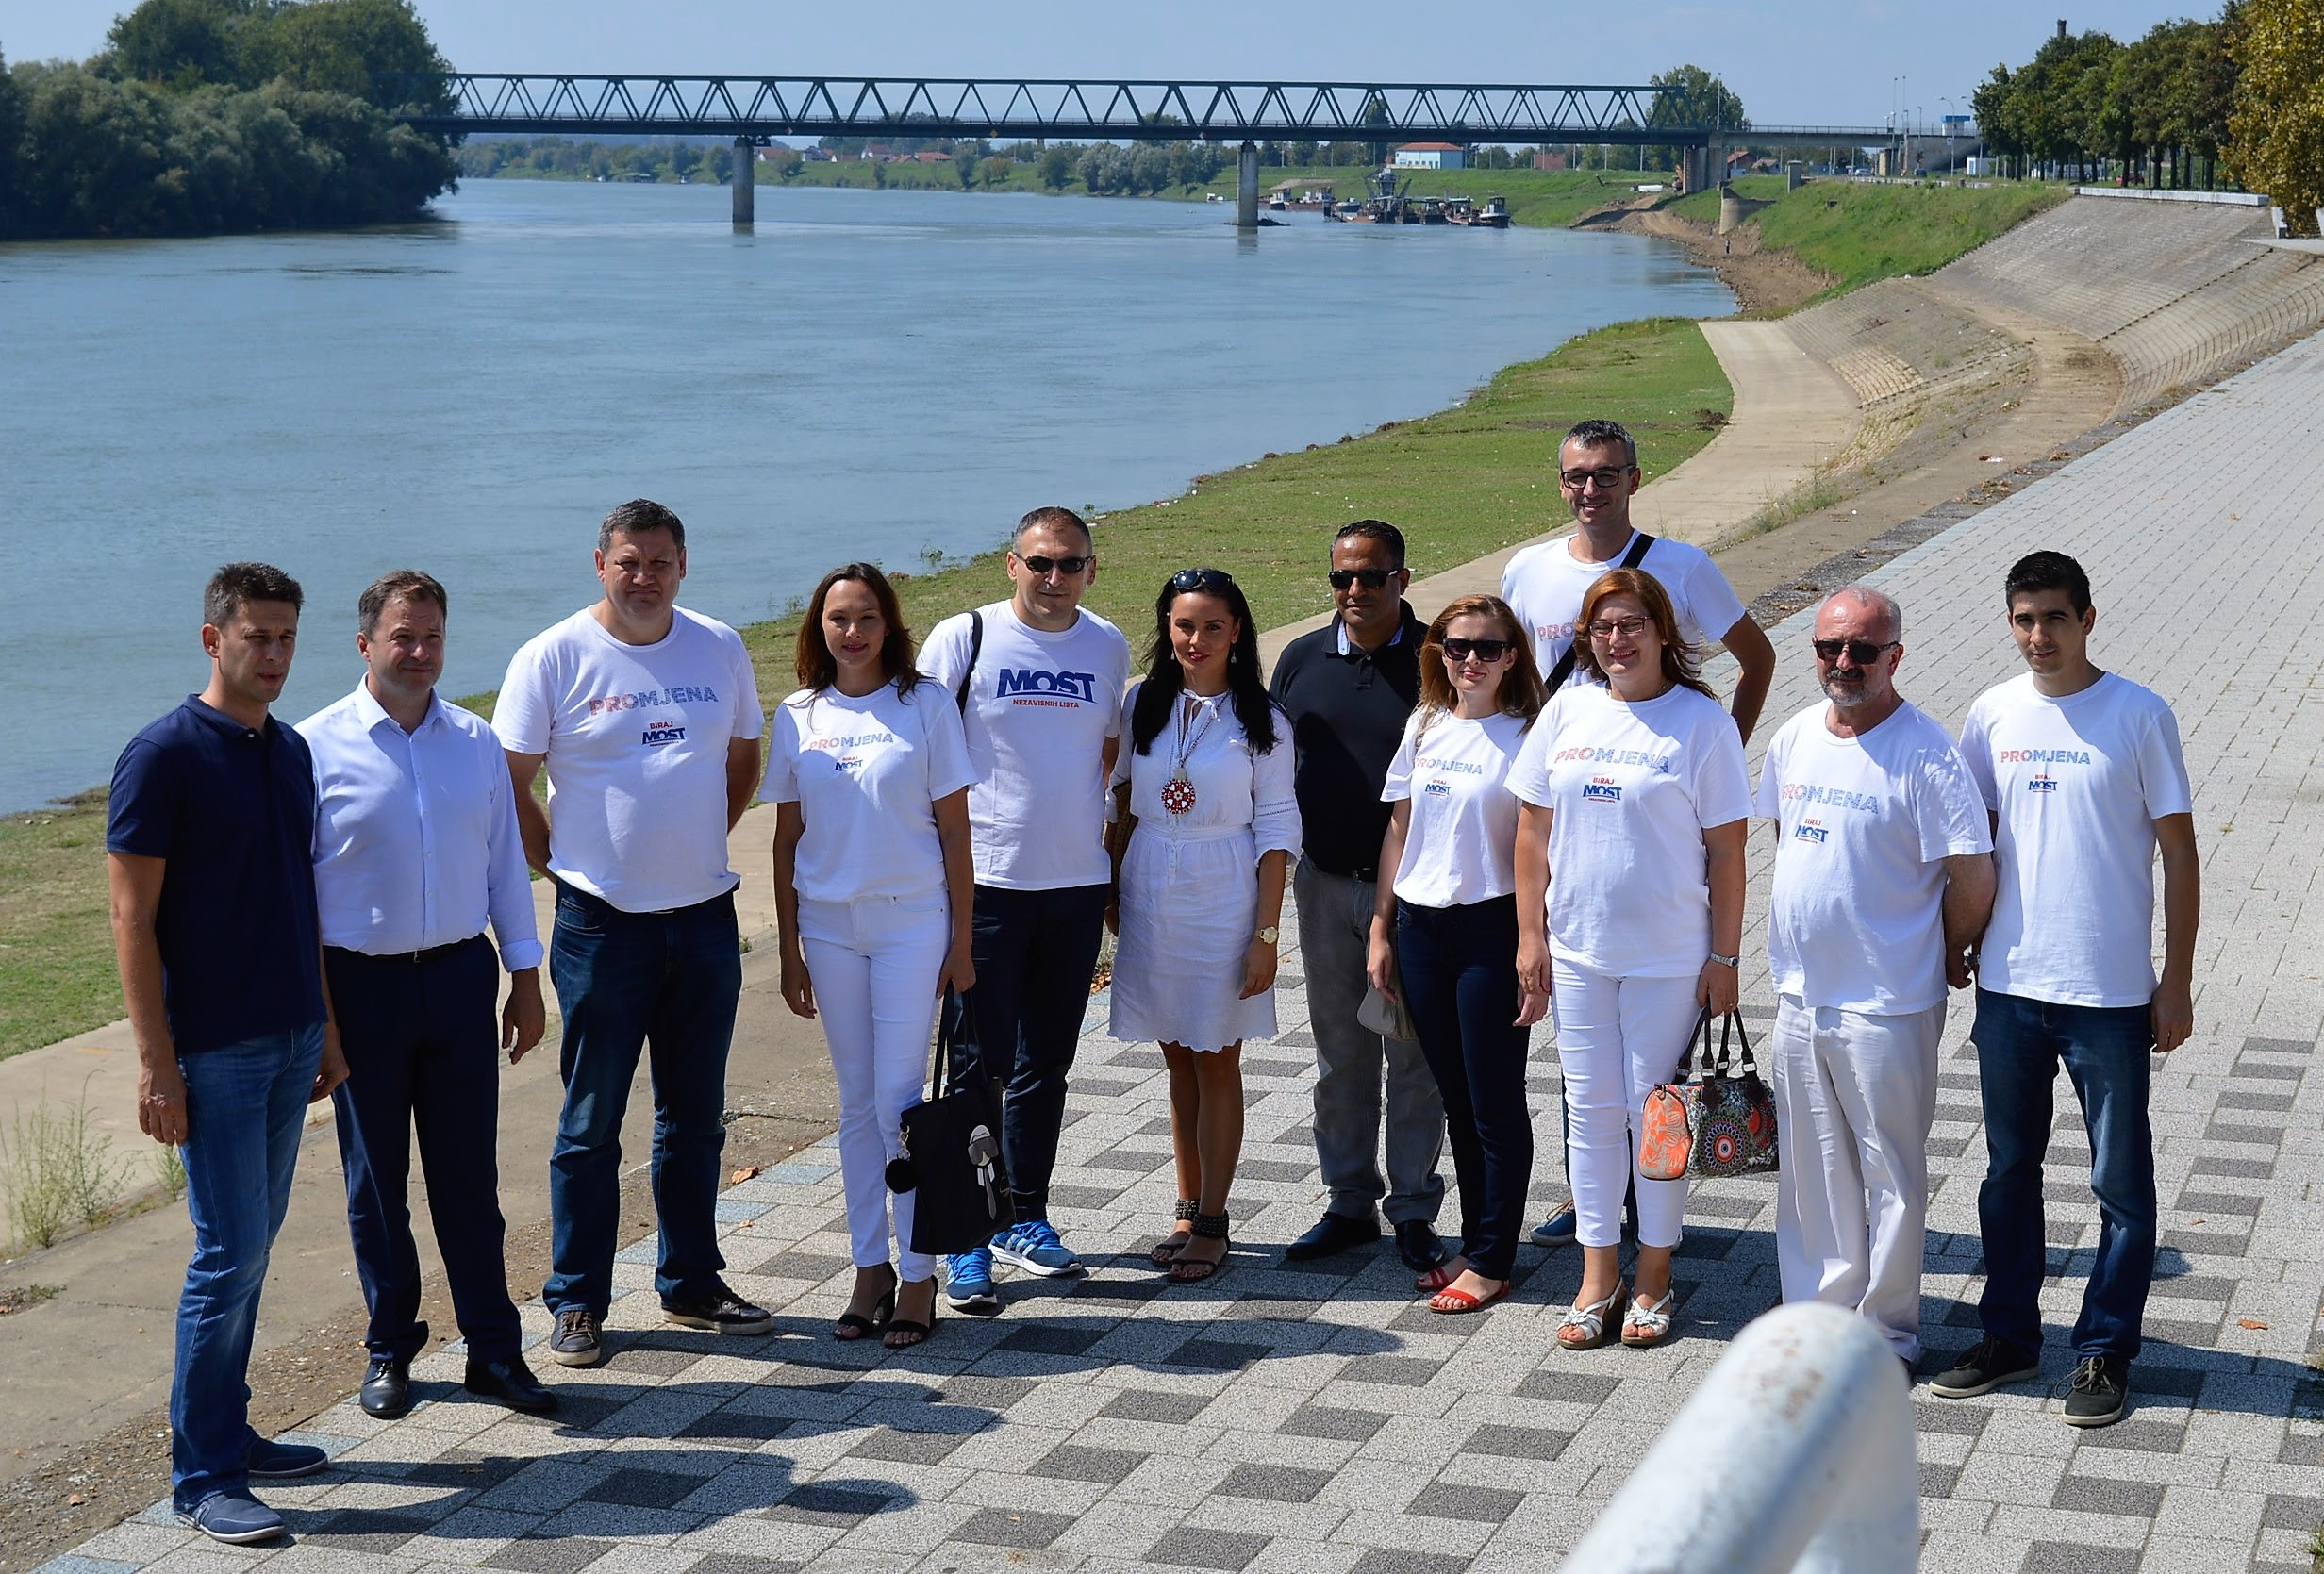 Petrov u Slavonskom Brodu: Poljoprivredno zemljište treba dati hrvatskom seljaku